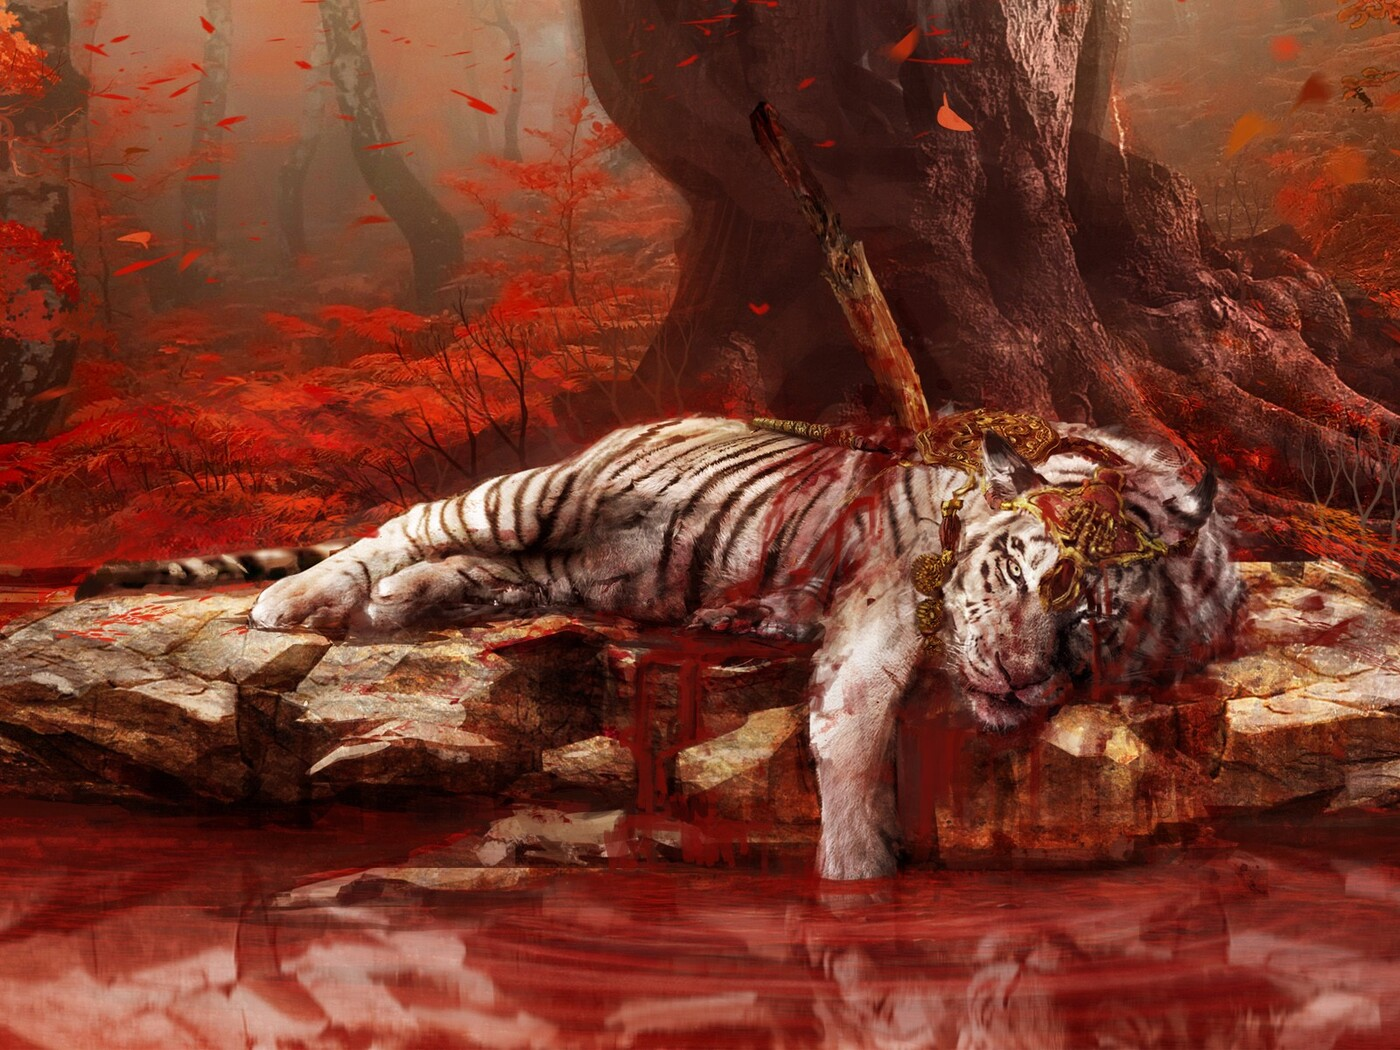 dead-tiger-in-far-cry-4.jpg